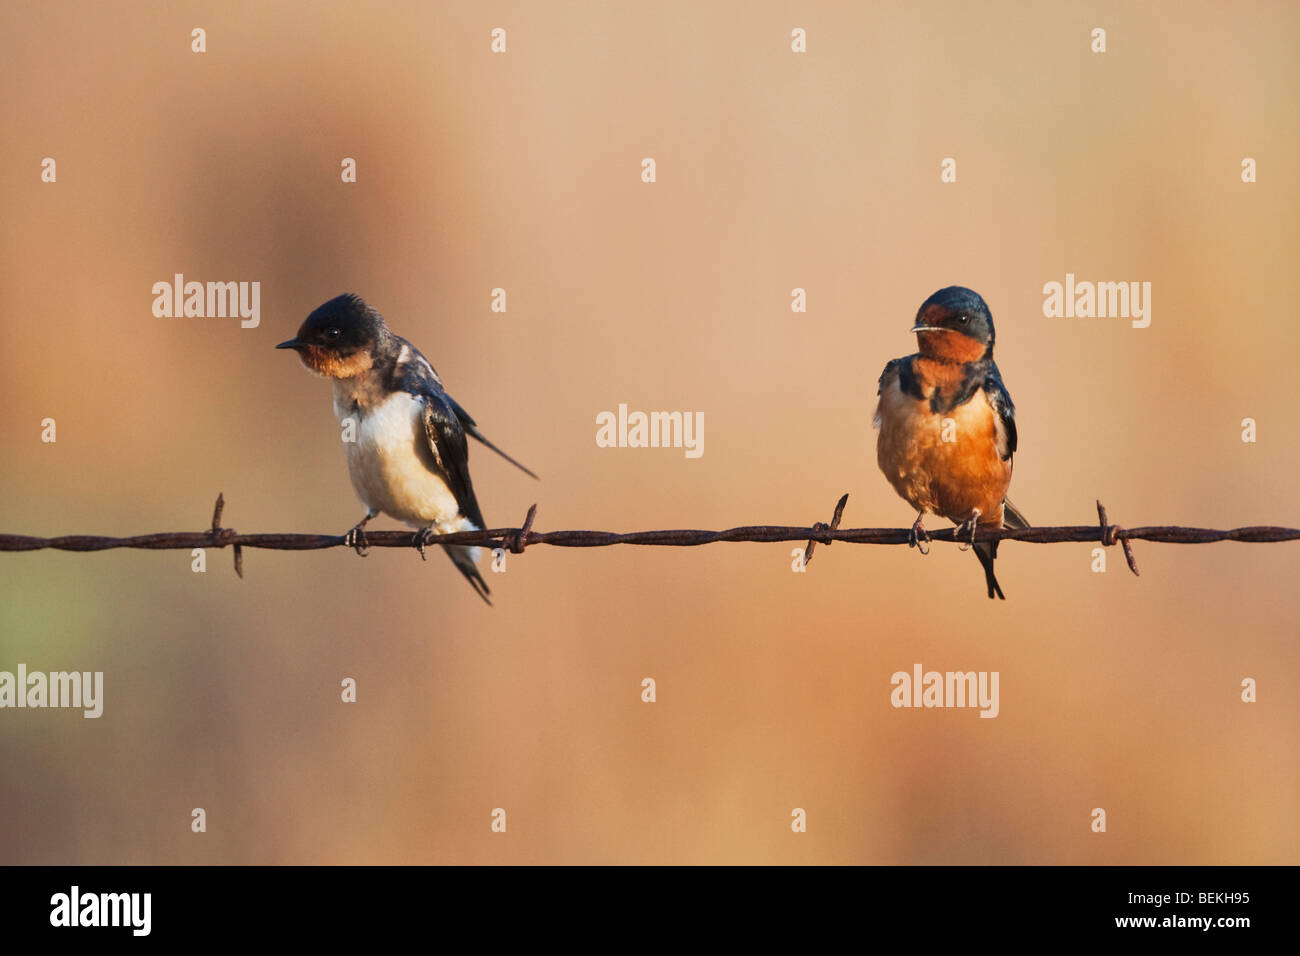 Barn Swallow (Hirundo rustica), pair on barbed wire, Sinton, Corpus Christi, Coastal Bend, Texas, USA Stock Photo